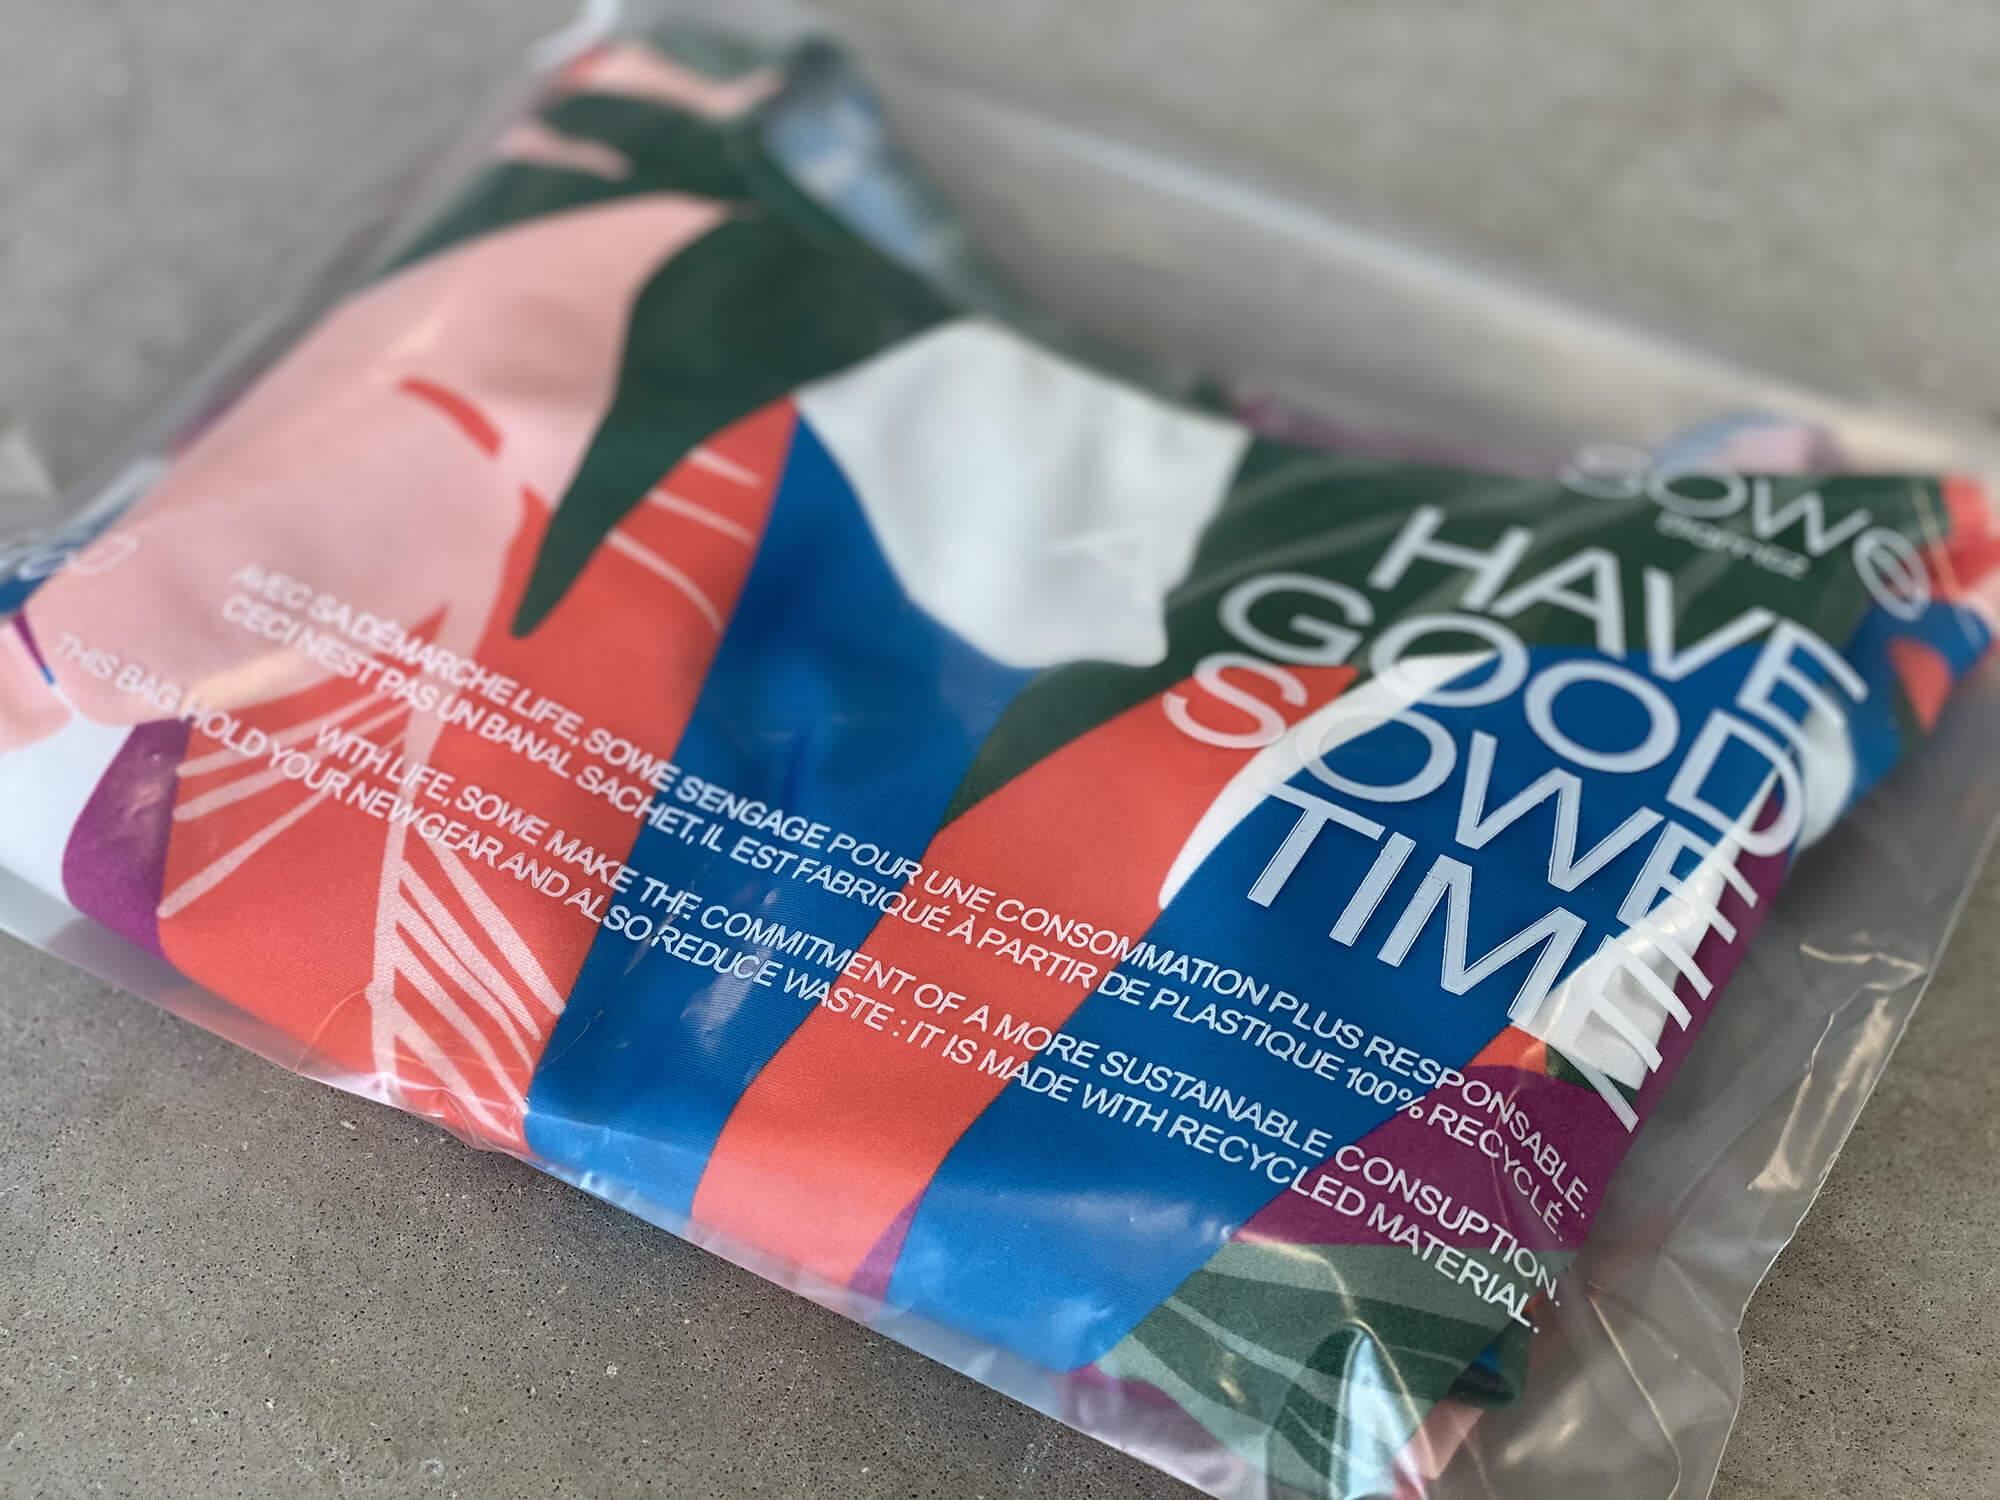 Sowe Biarritz emballage recyclé